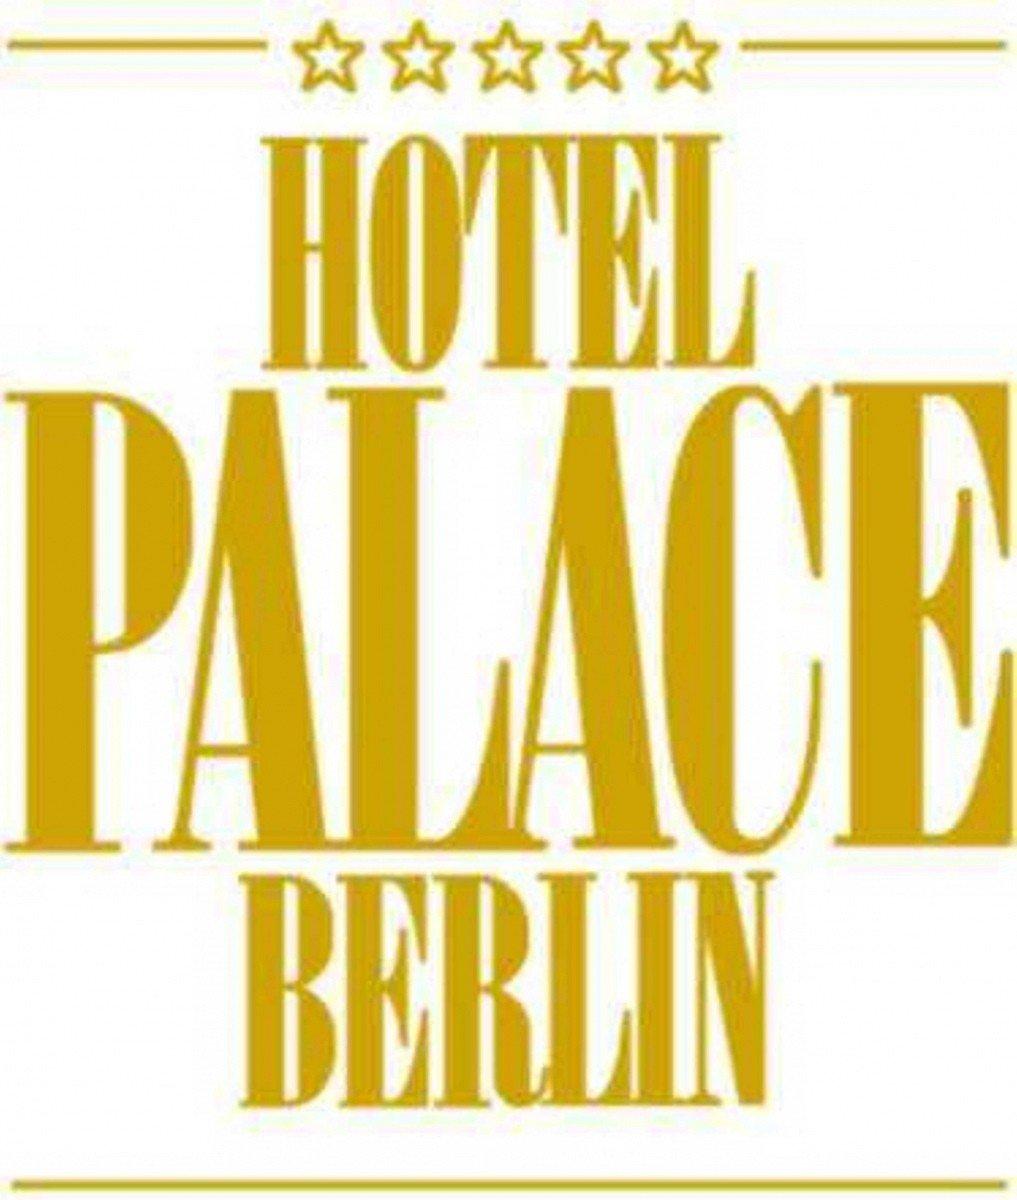 hotel palace berlin duftbeschreibung und bewertung. Black Bedroom Furniture Sets. Home Design Ideas